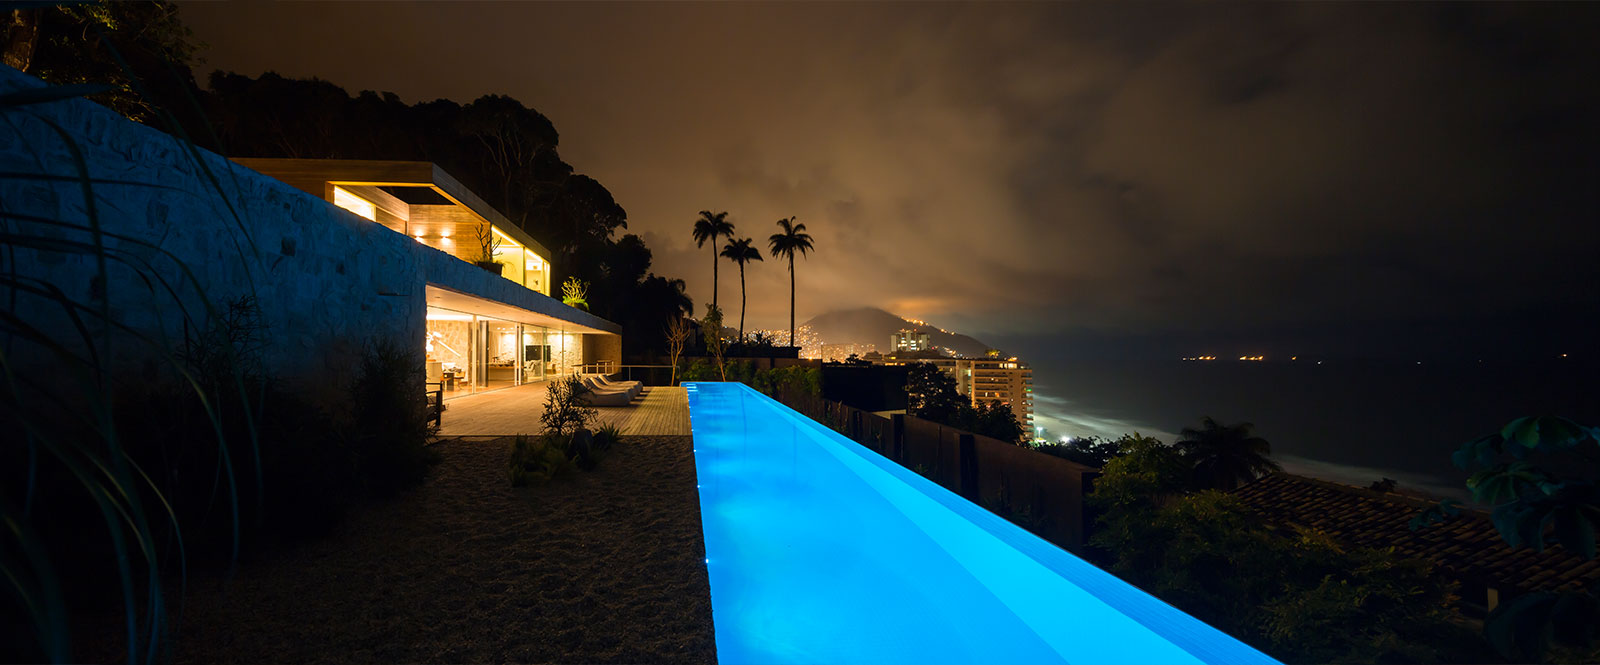 AL House : luxurious modern house in Rio de Janeiro Brazil